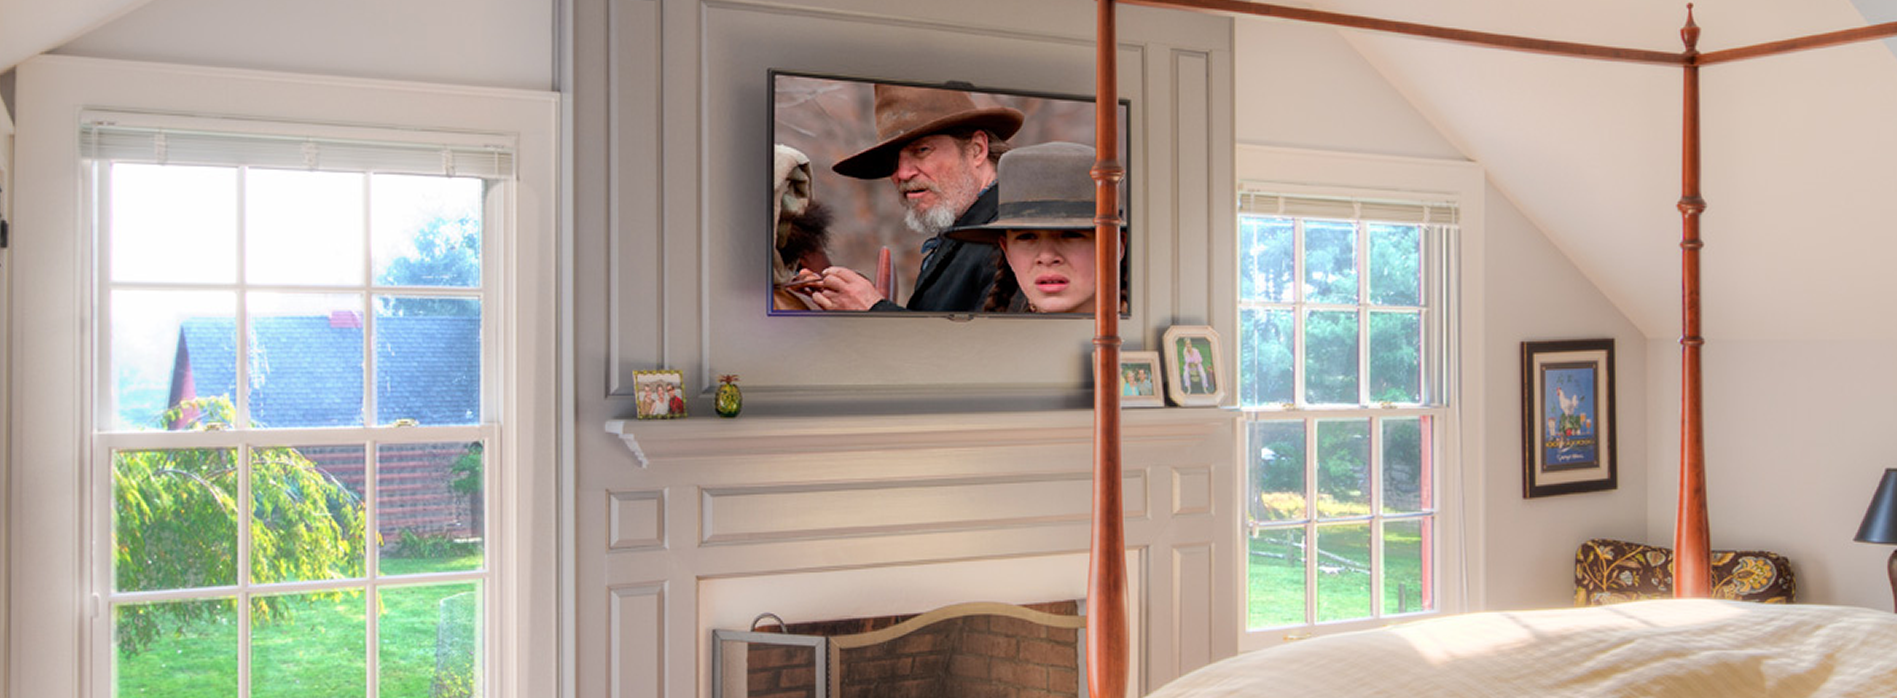 Long-Island-TV Installation Swivel Mount